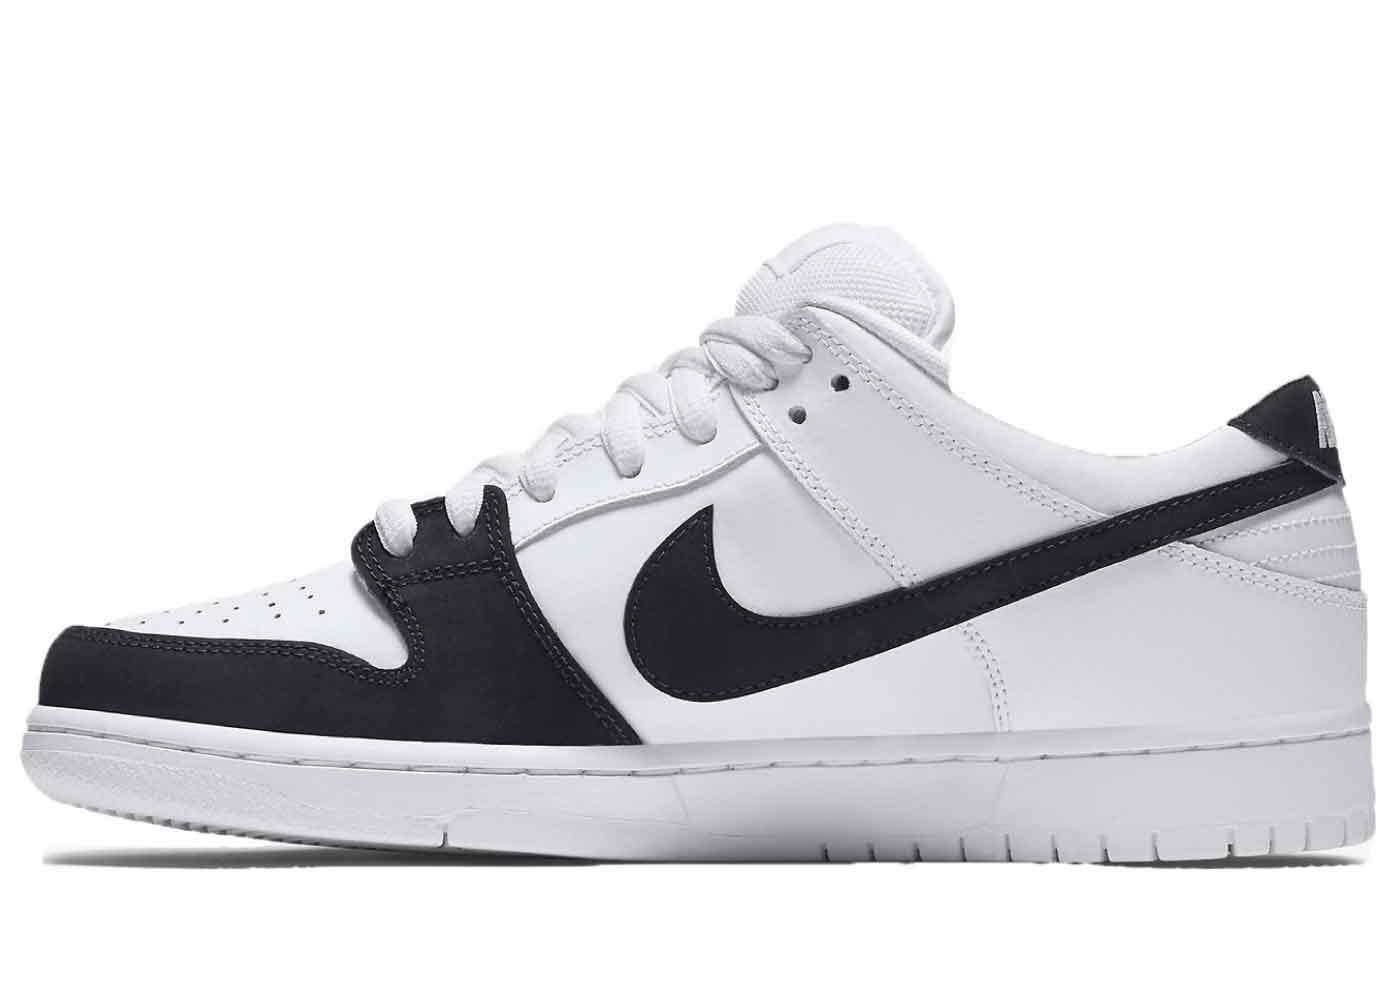 Nike SB Dunk Low Yin Yang の写真